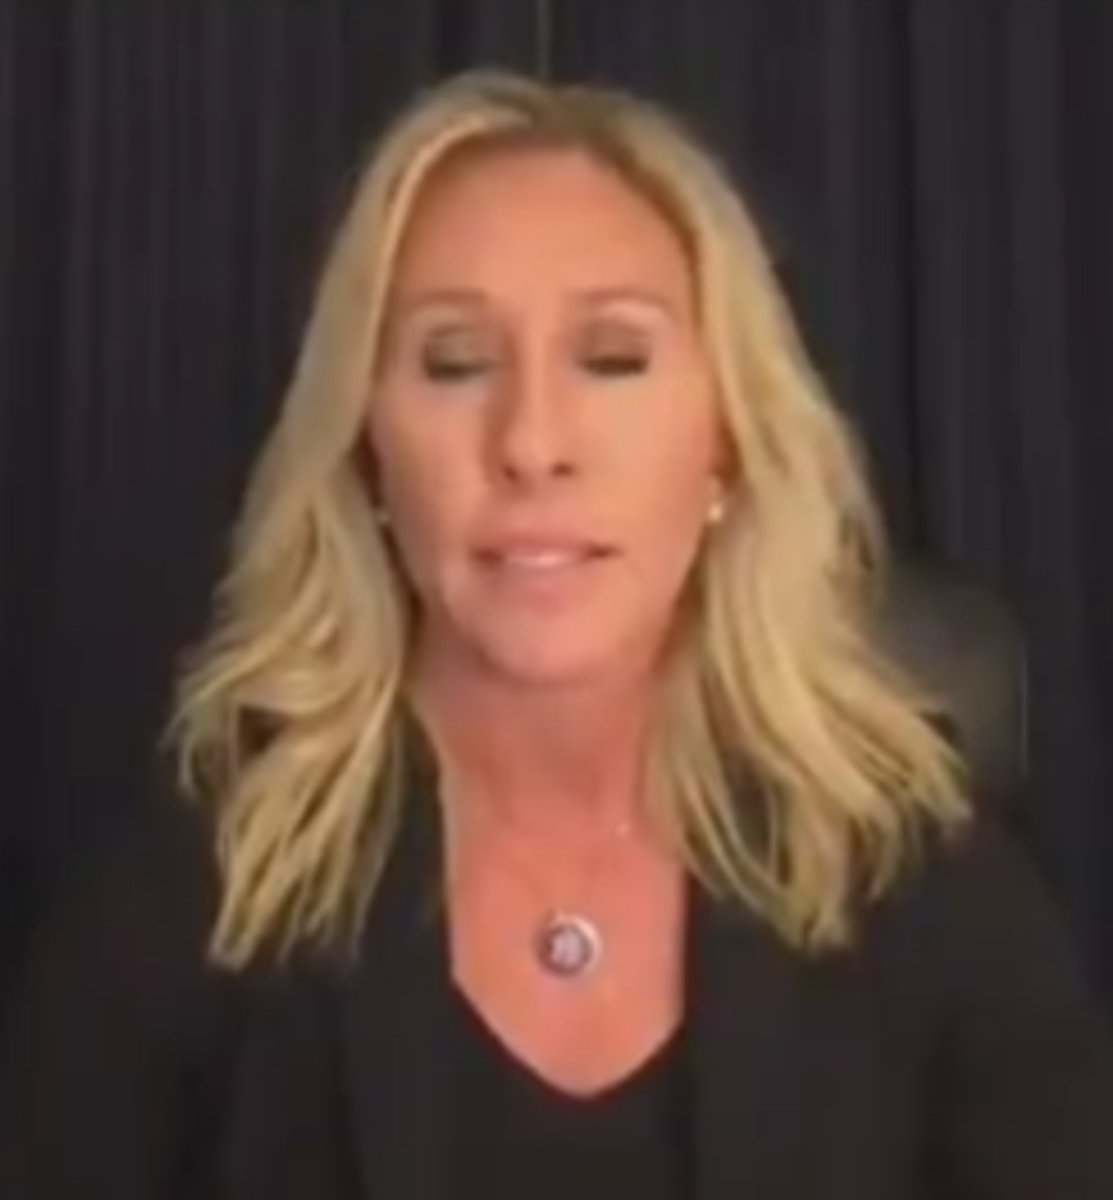 @atrupar Wake up Karen! Who elected Karen to congress? #Narcolepsy  #Tomi #AmericaOrTrump #ExpelTheSeditionists #ExpelTedCruz #ExpelJoshHawley #impeach #ImpeachTrumpAgainNOW #LaurenBoebert #MorningJoe